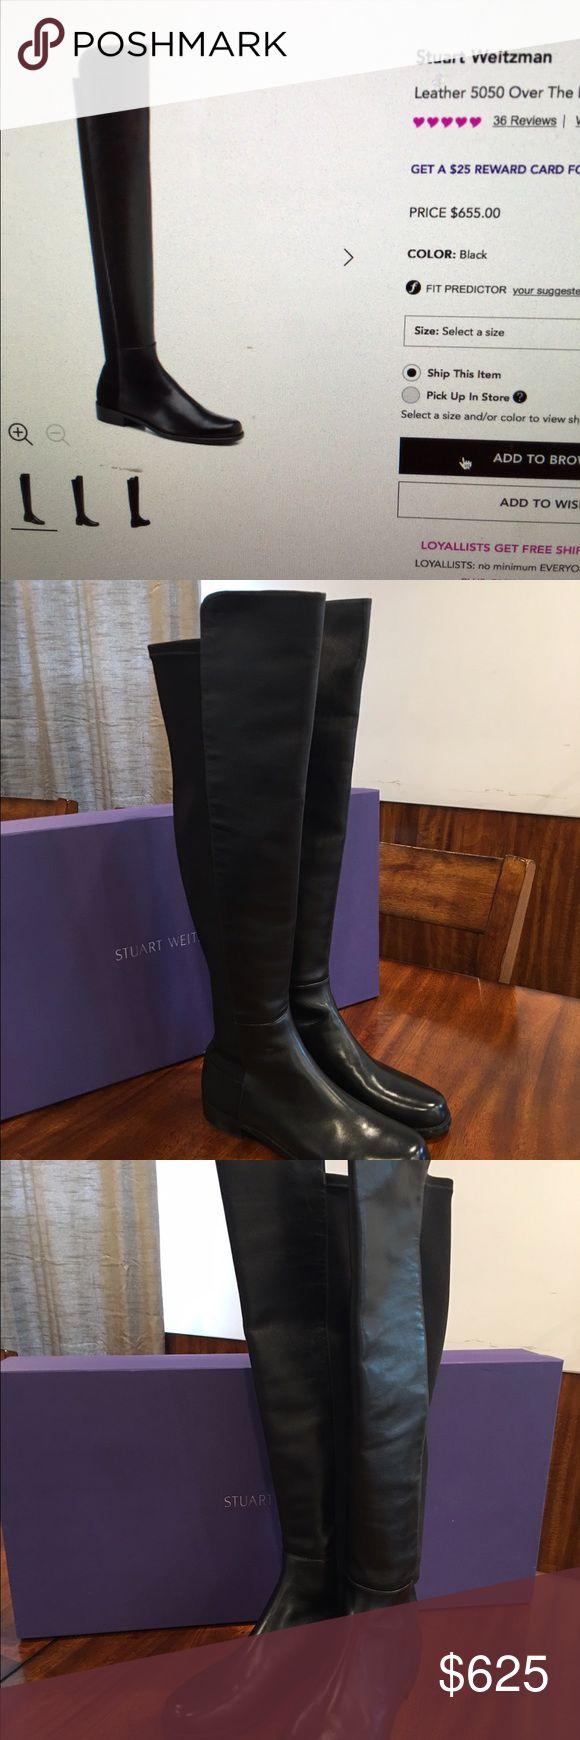 Stuart Weitzman Leather 5050 O/T/K Boots Stuart Weitzman Leather 5050 Over The Knee Boots (New/Never Worn) Stuart Weitzman Shoes Over the Knee Boots